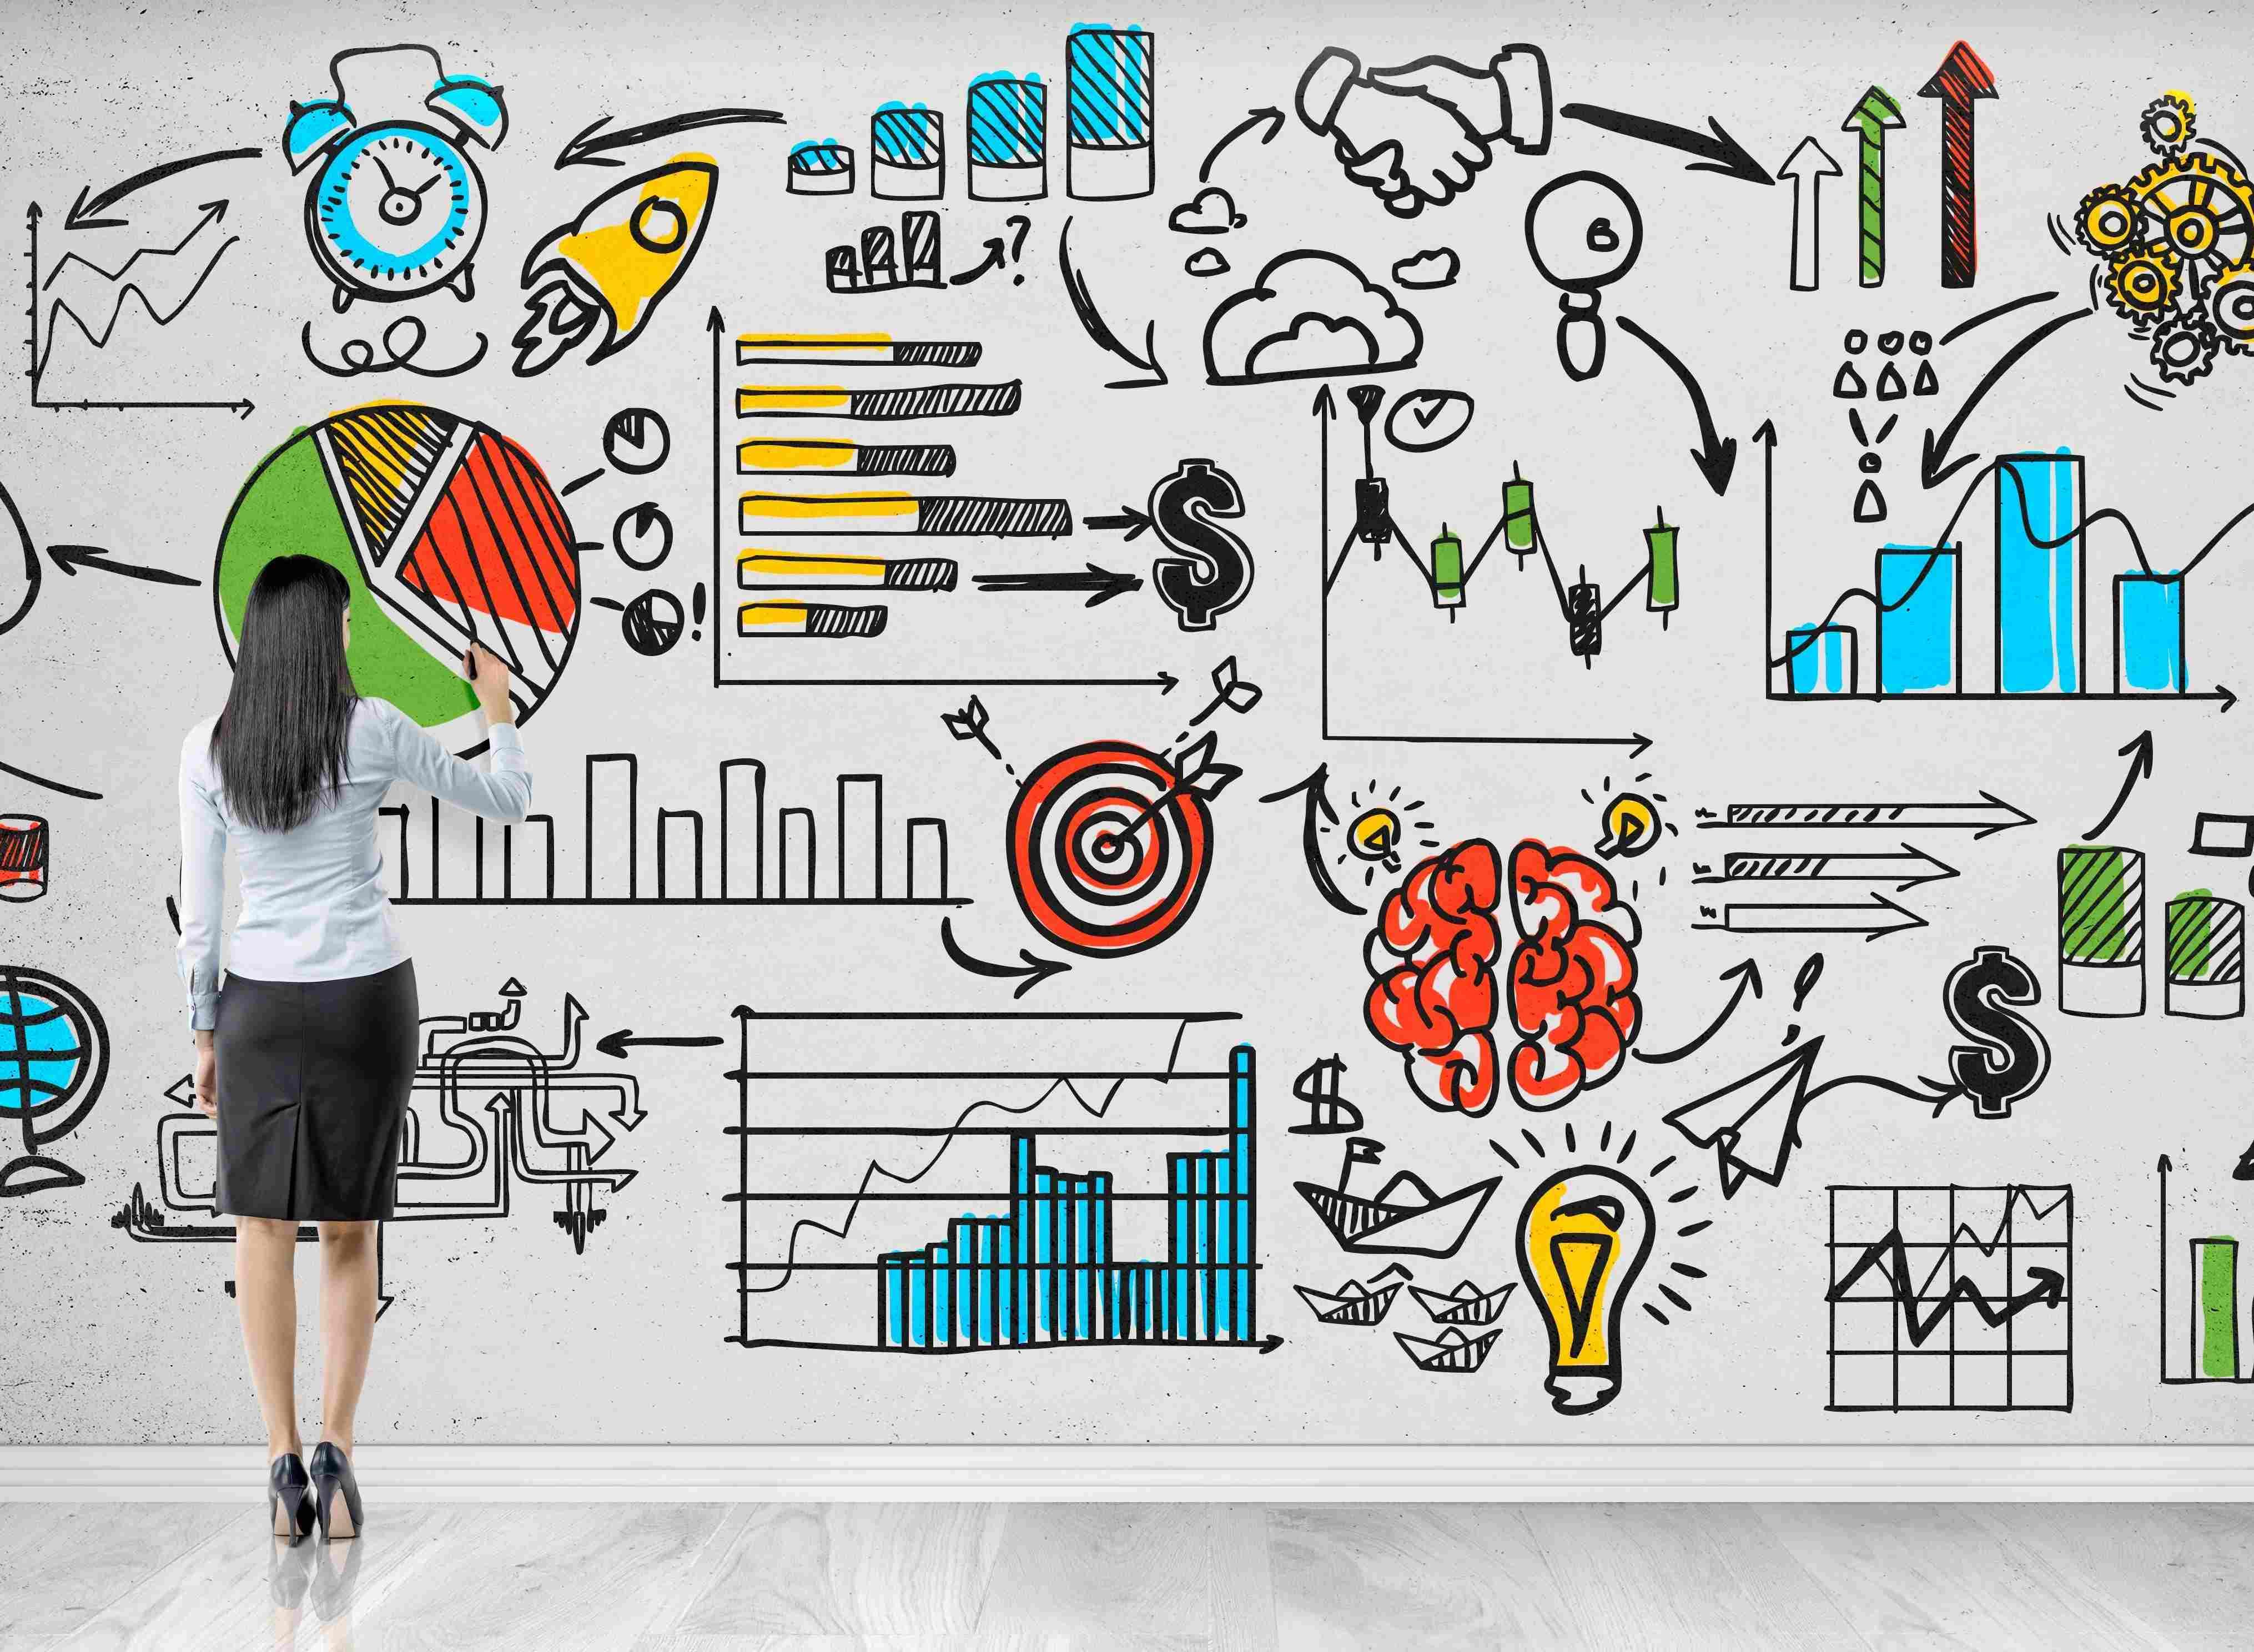 Estrategia para emprendedores